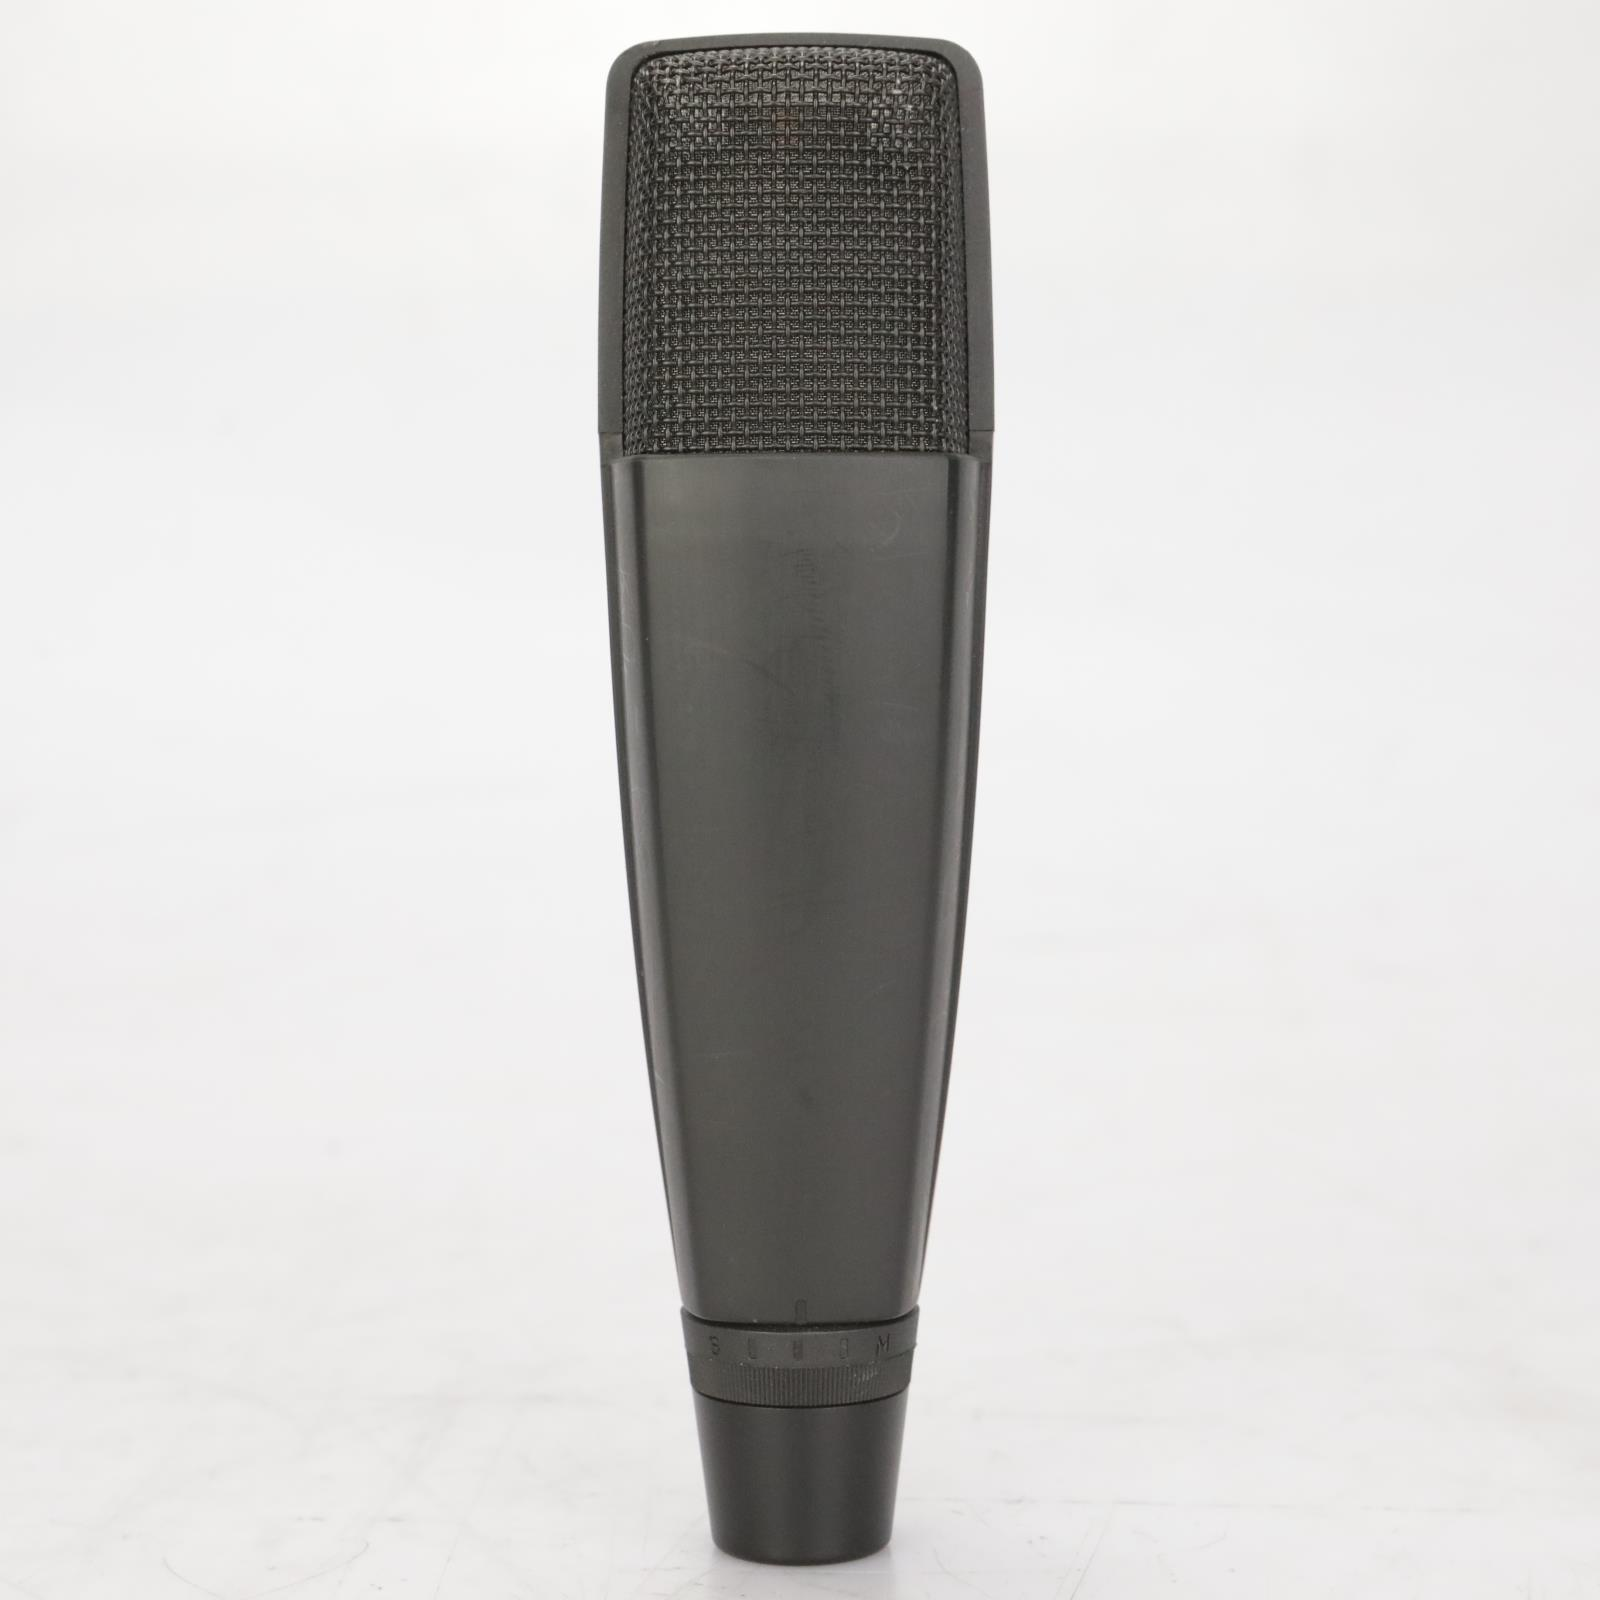 Sennheiser MD 421-II Dynamic Microphone w/ Case #38331